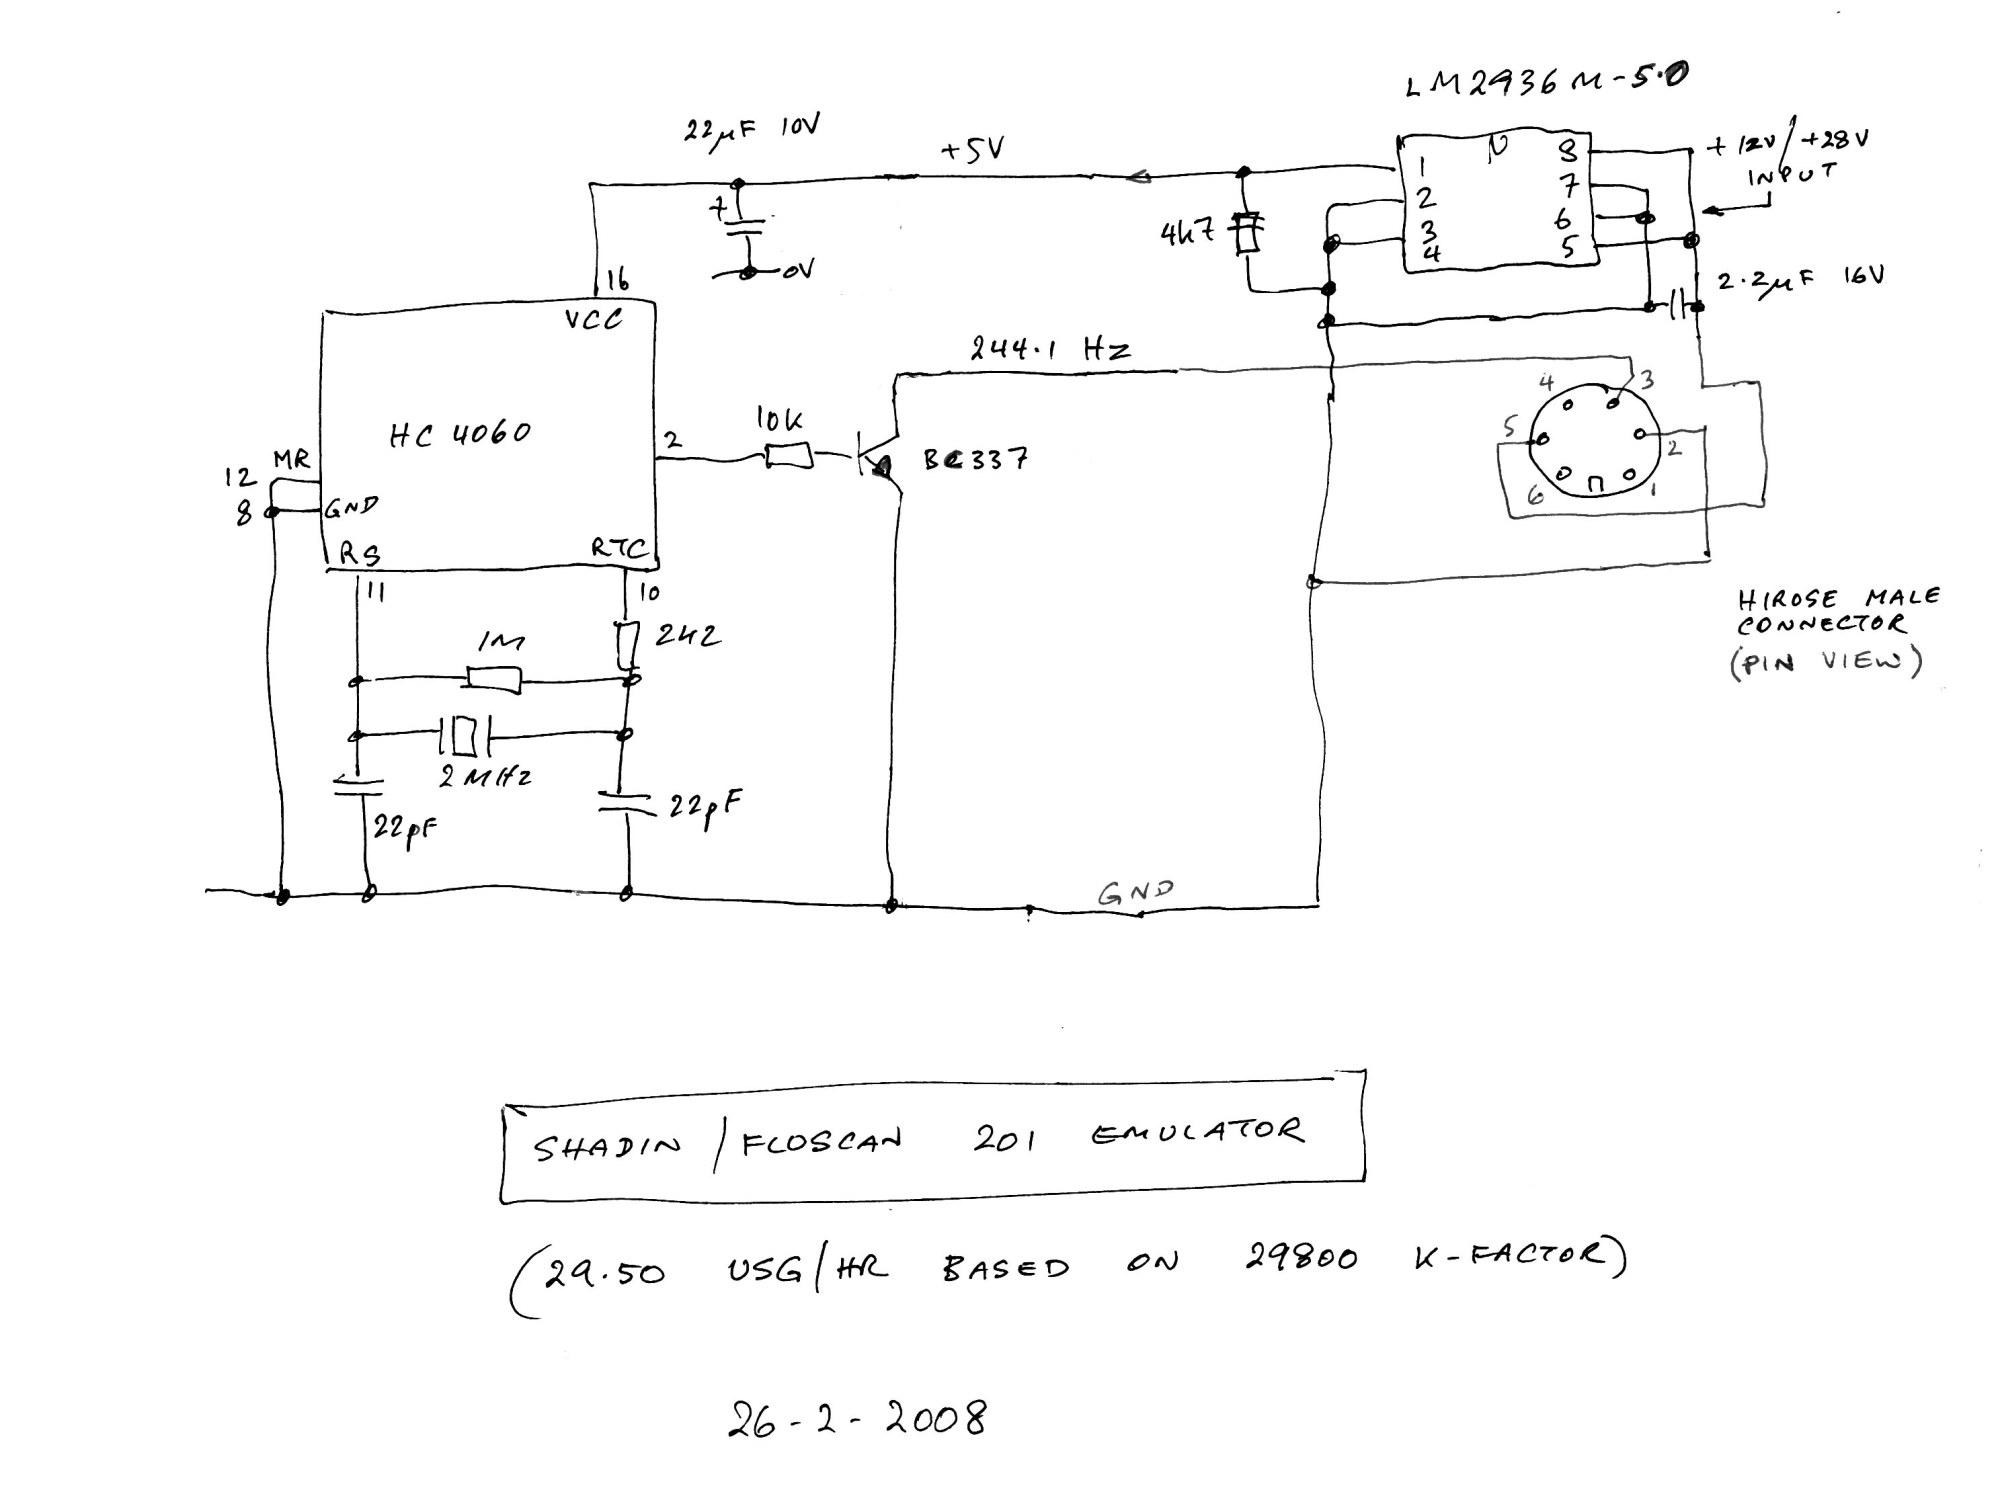 hight resolution of floscan wiring diagram wiring diagram gp floscan wiring diagram floscan wiring diagram